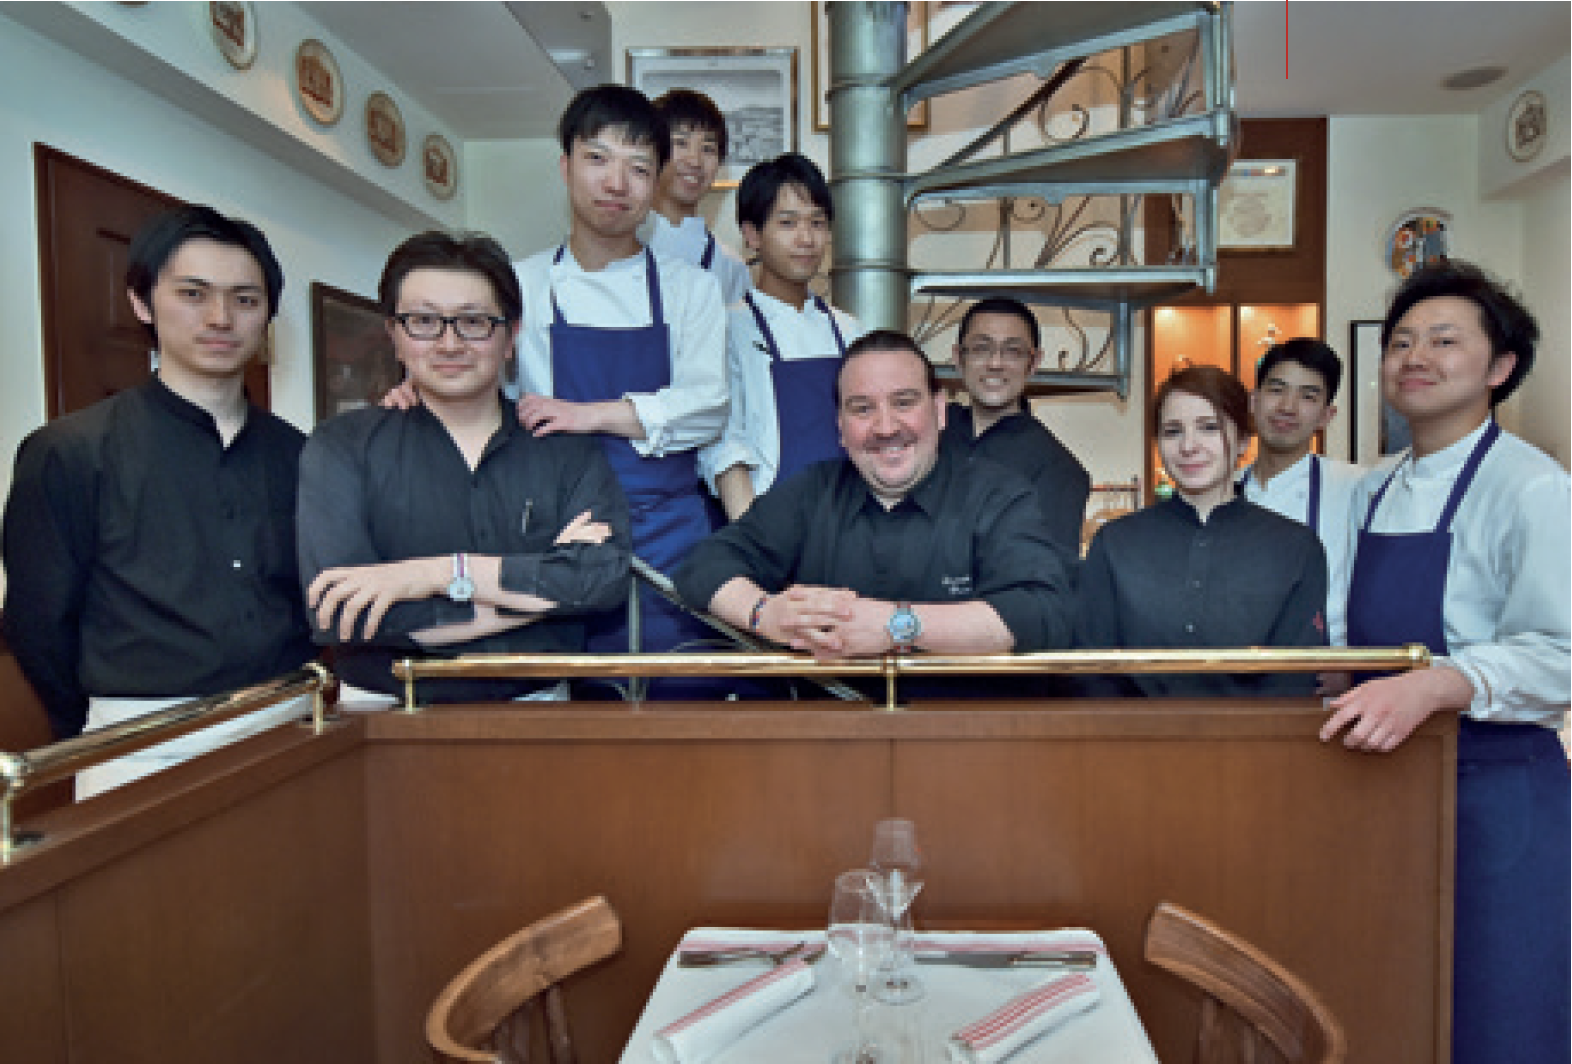 Restaurant Le Lugdunum - Christophe PAUCOD